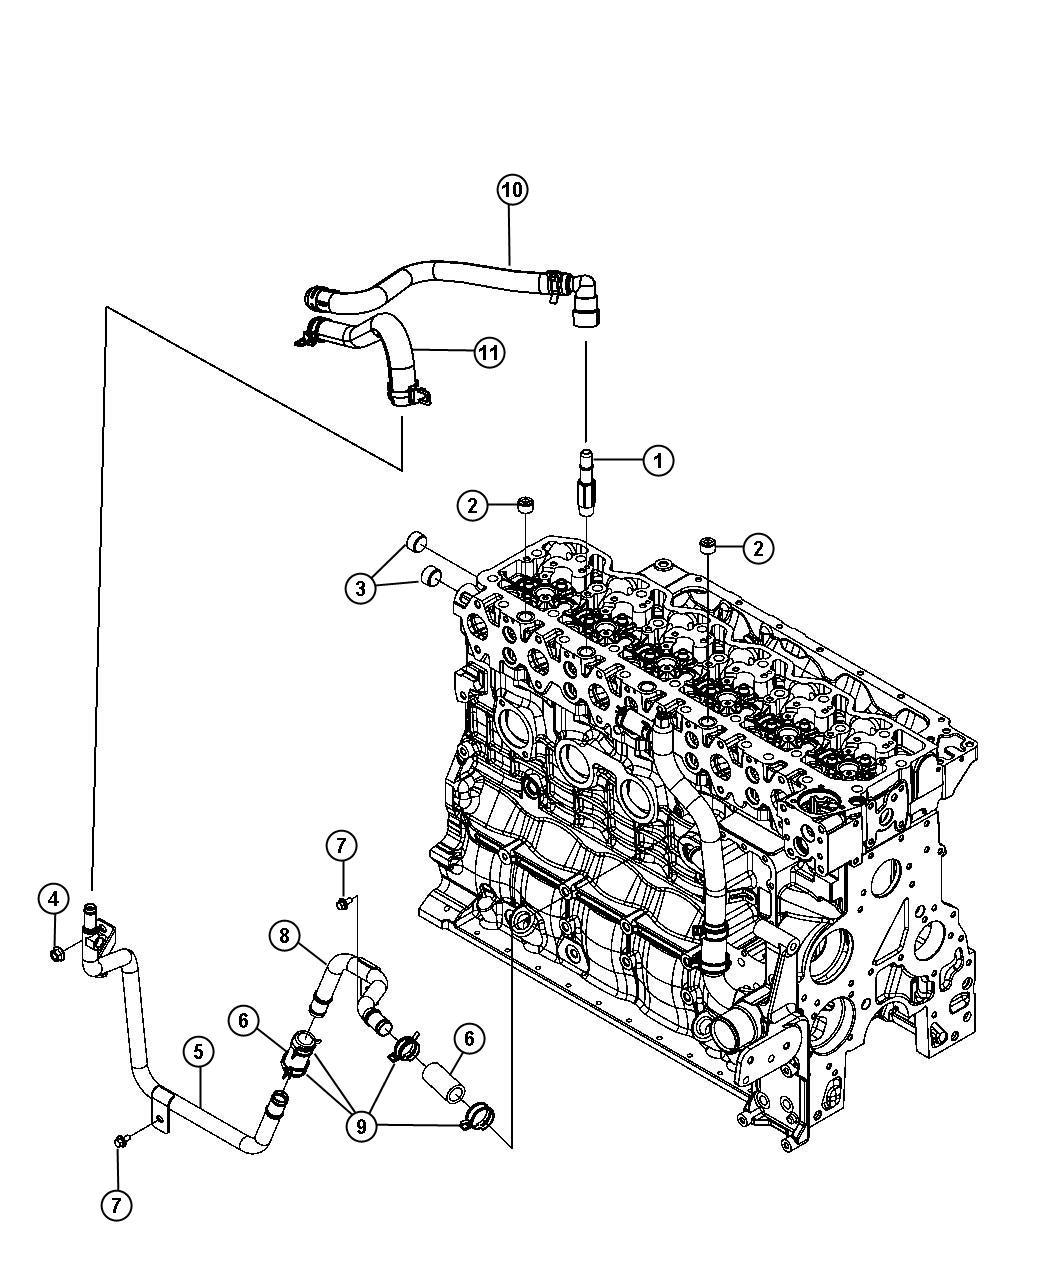 2008 Dodge Ram 5500 Hose. Heater, heater supply. Plumbing